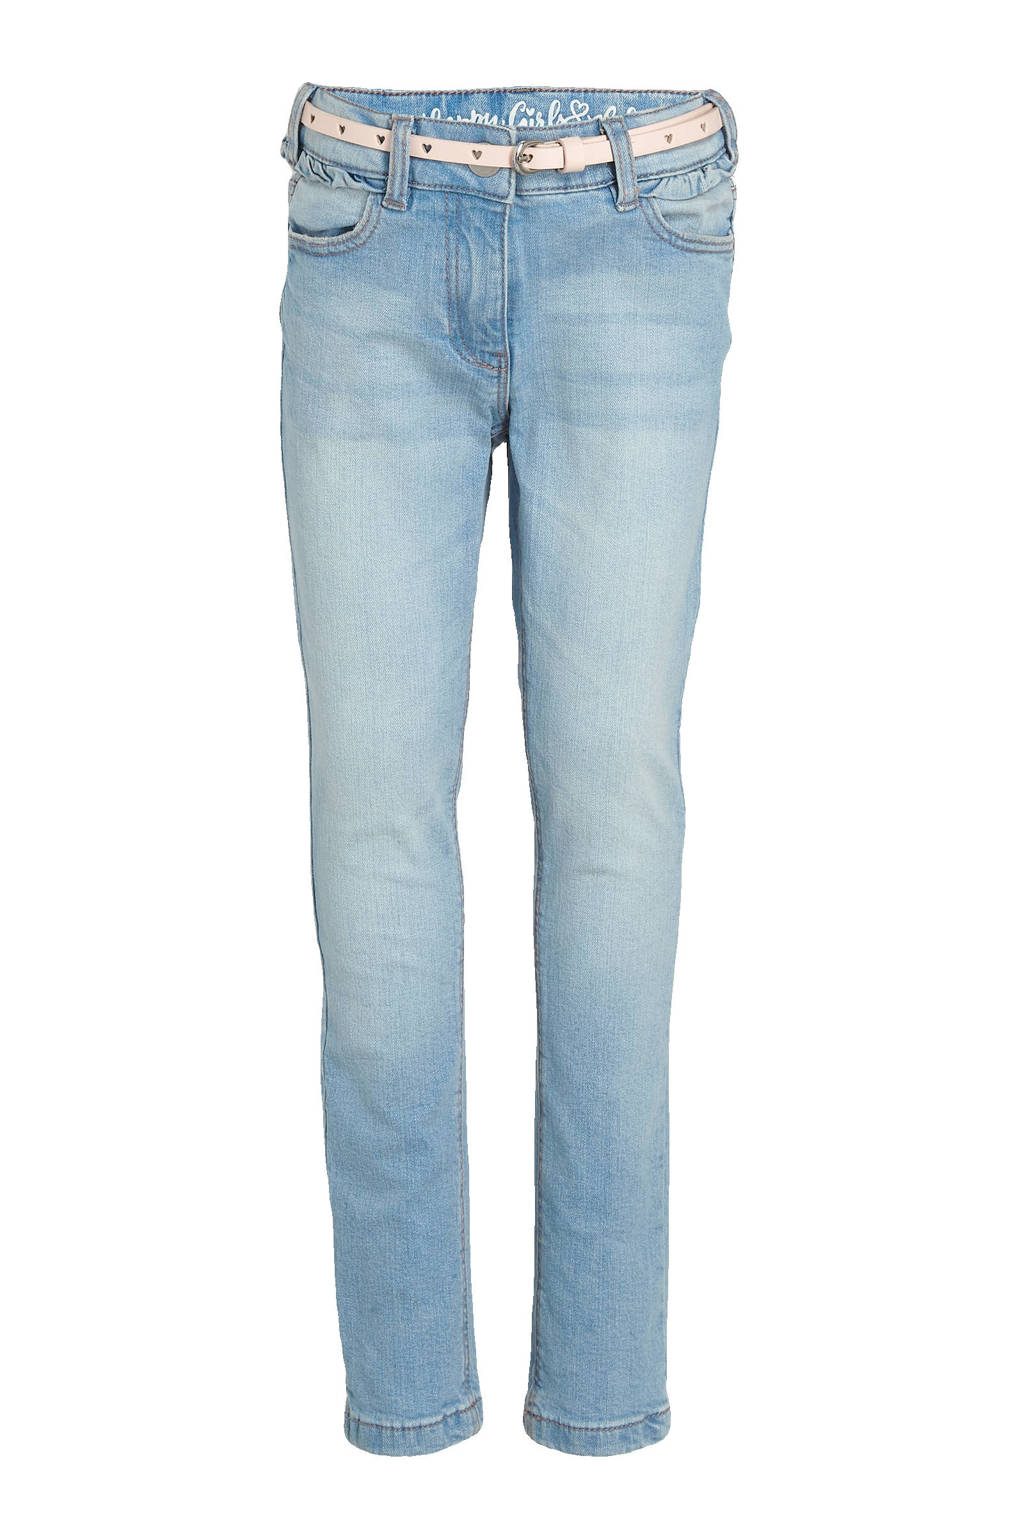 C&A Palomino skinny jeans light denim, Light denim